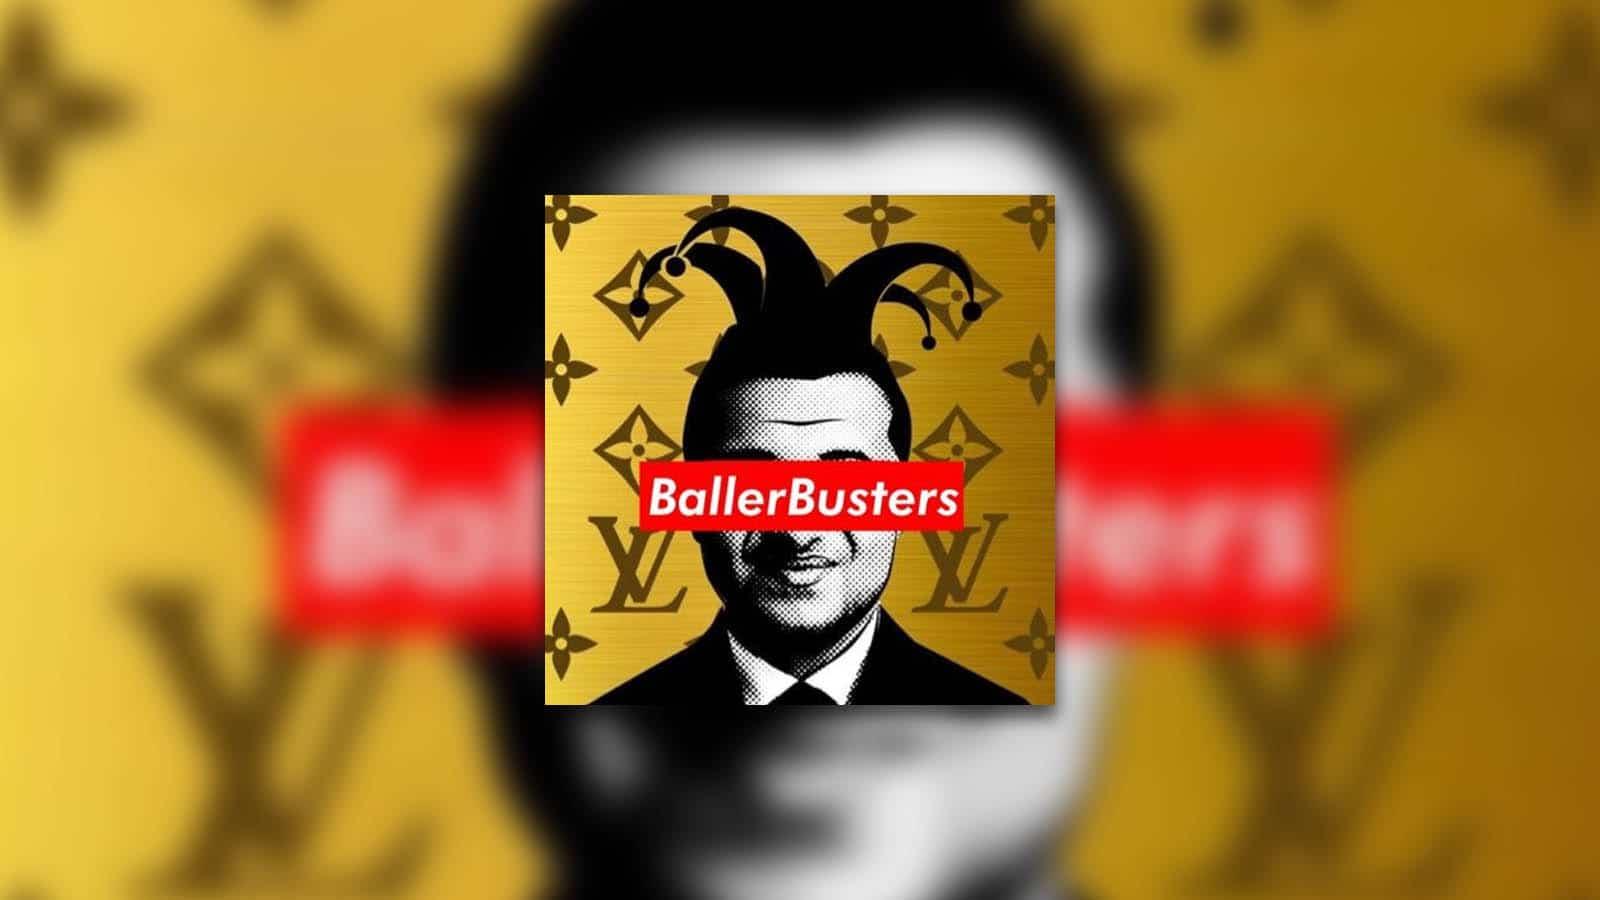 ballerbusters instagram logo